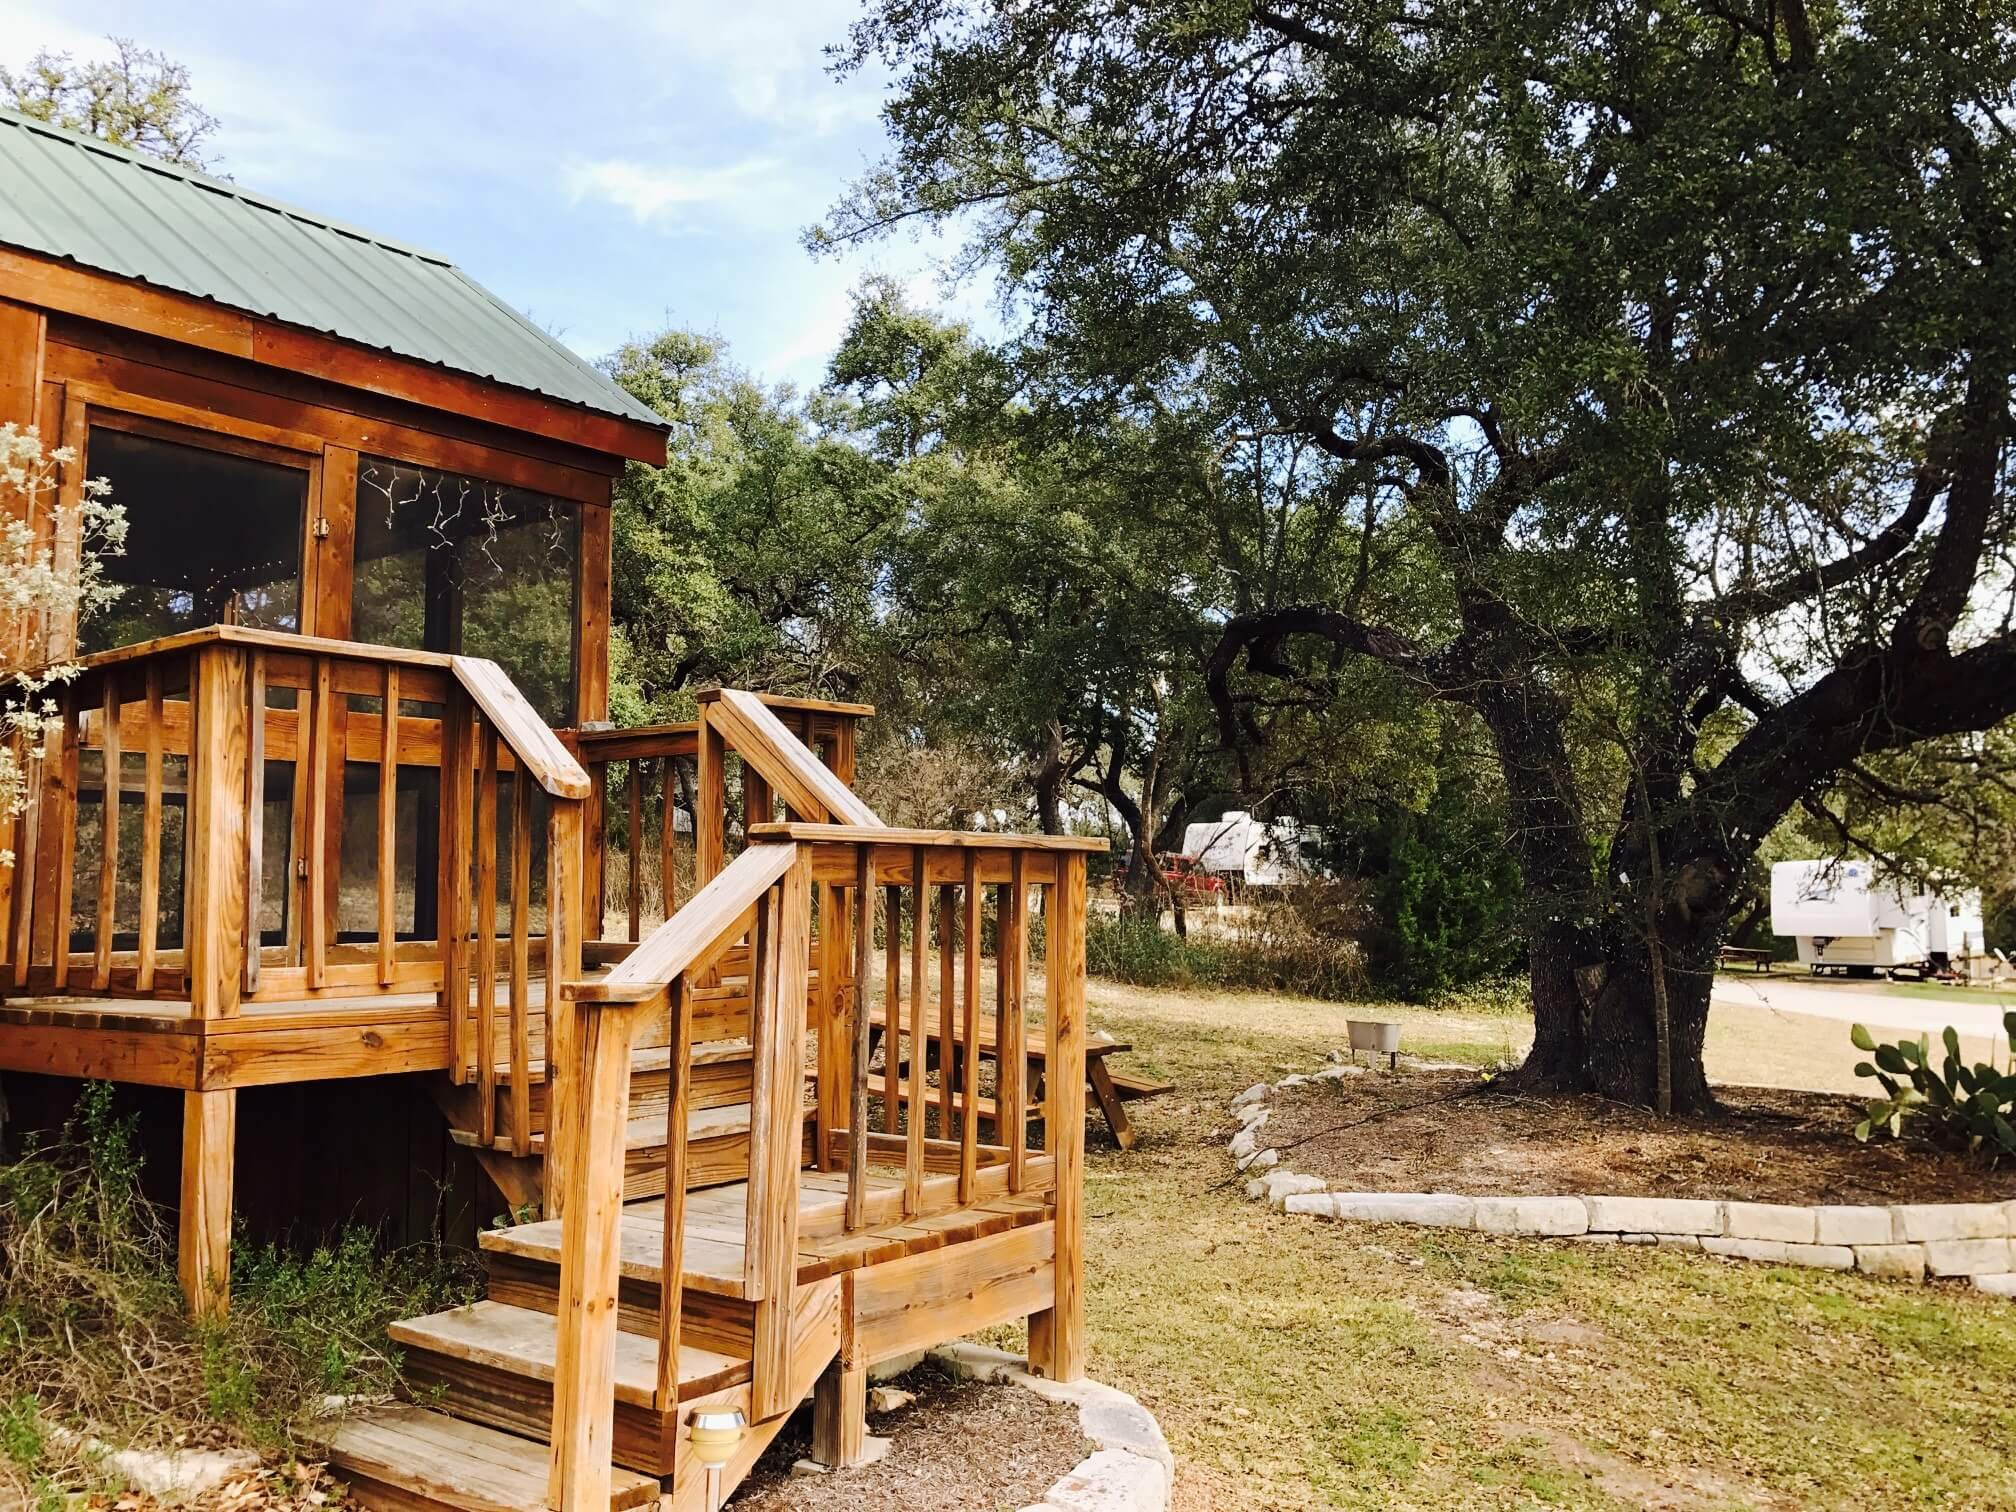 Rocky creek cabin for rent at sunsetrv resort near austin tx for Austin cabin rentals